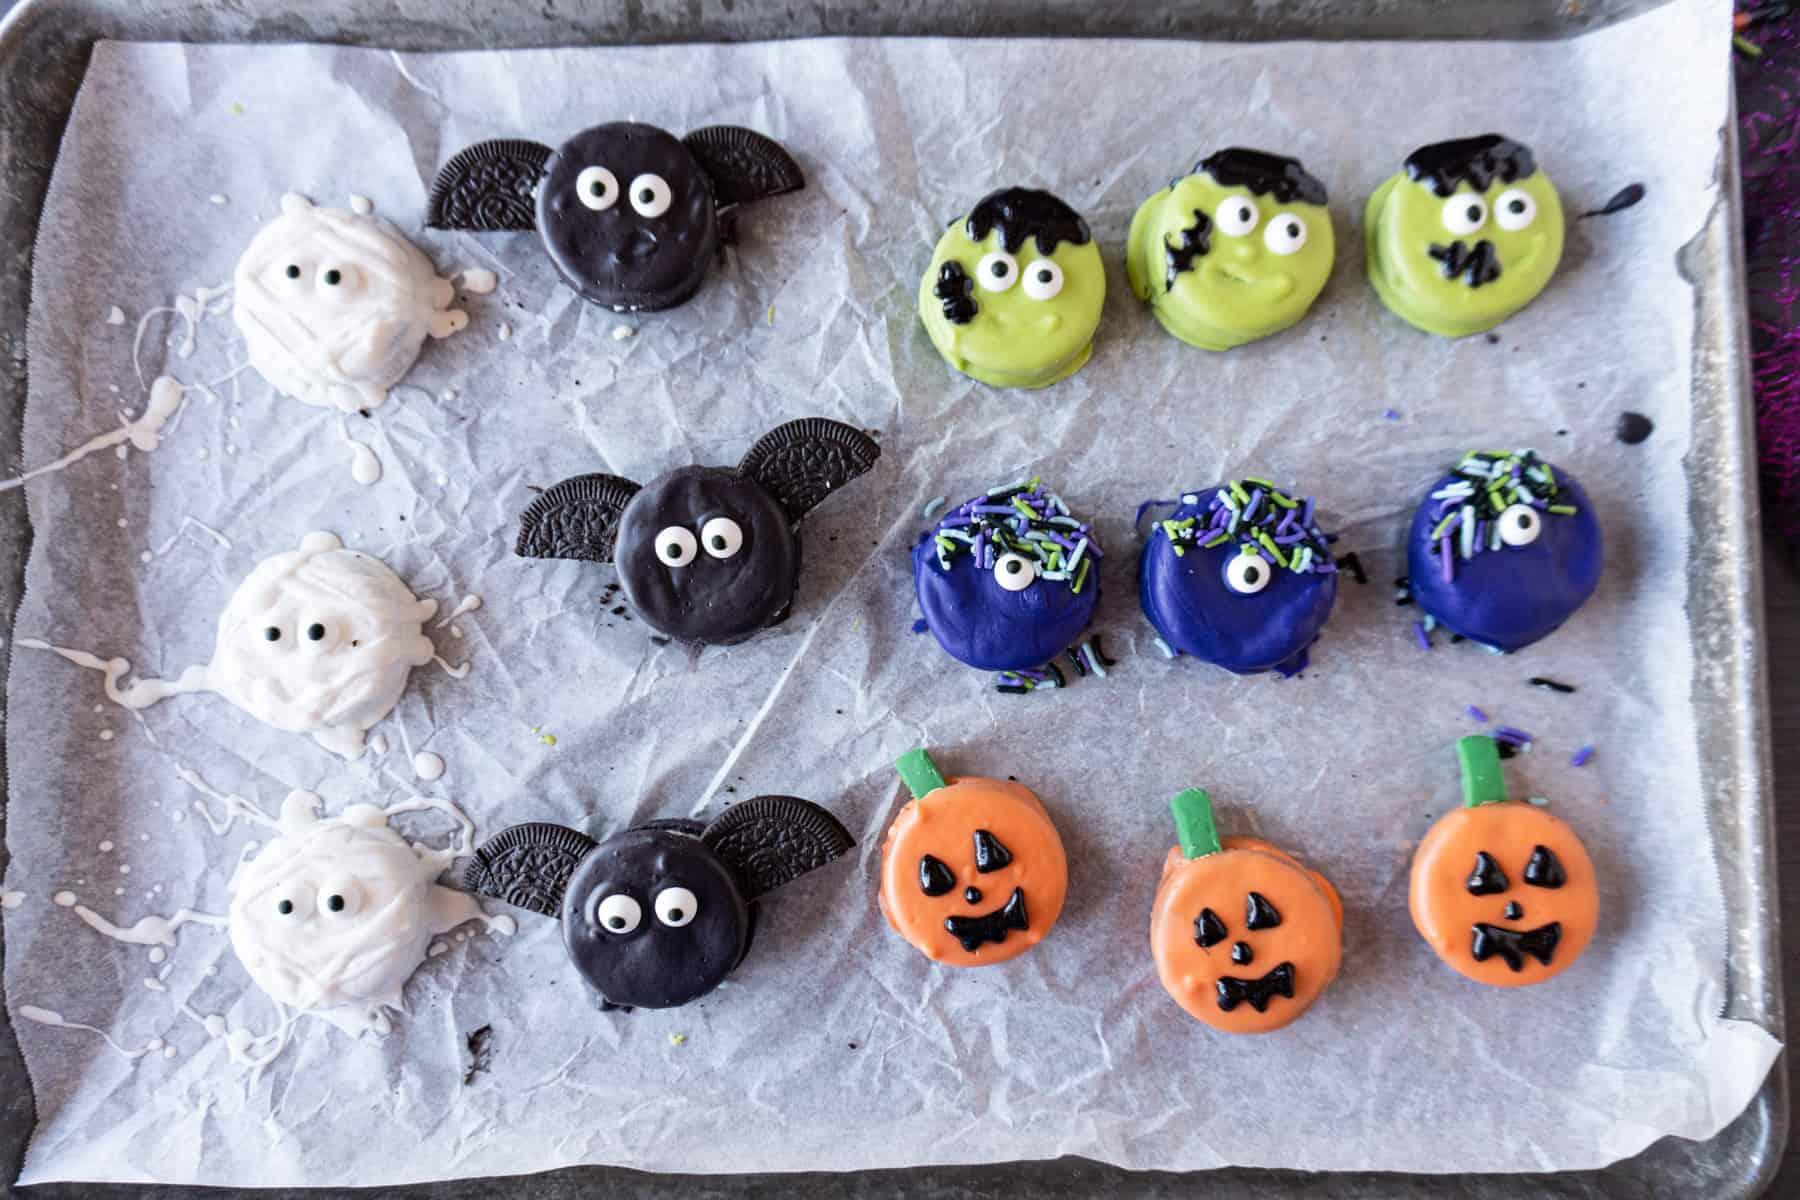 oreo halloween treats on parchment lined baking sheet